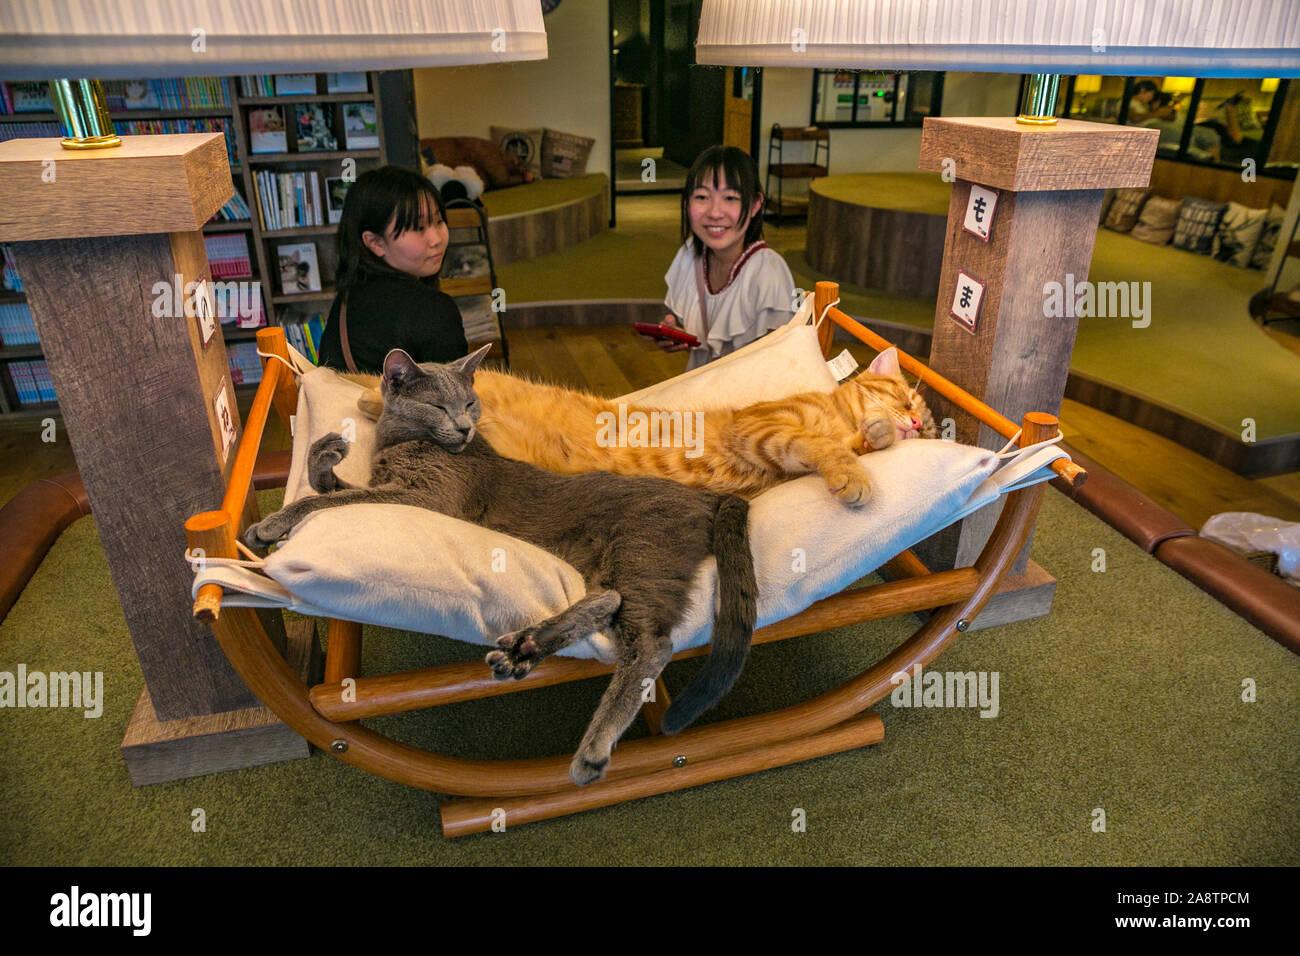 Cat Cafe Mocha Lounge Ikebukuro District Toshima Tokyo Japan Asia Stock Photo Alamy